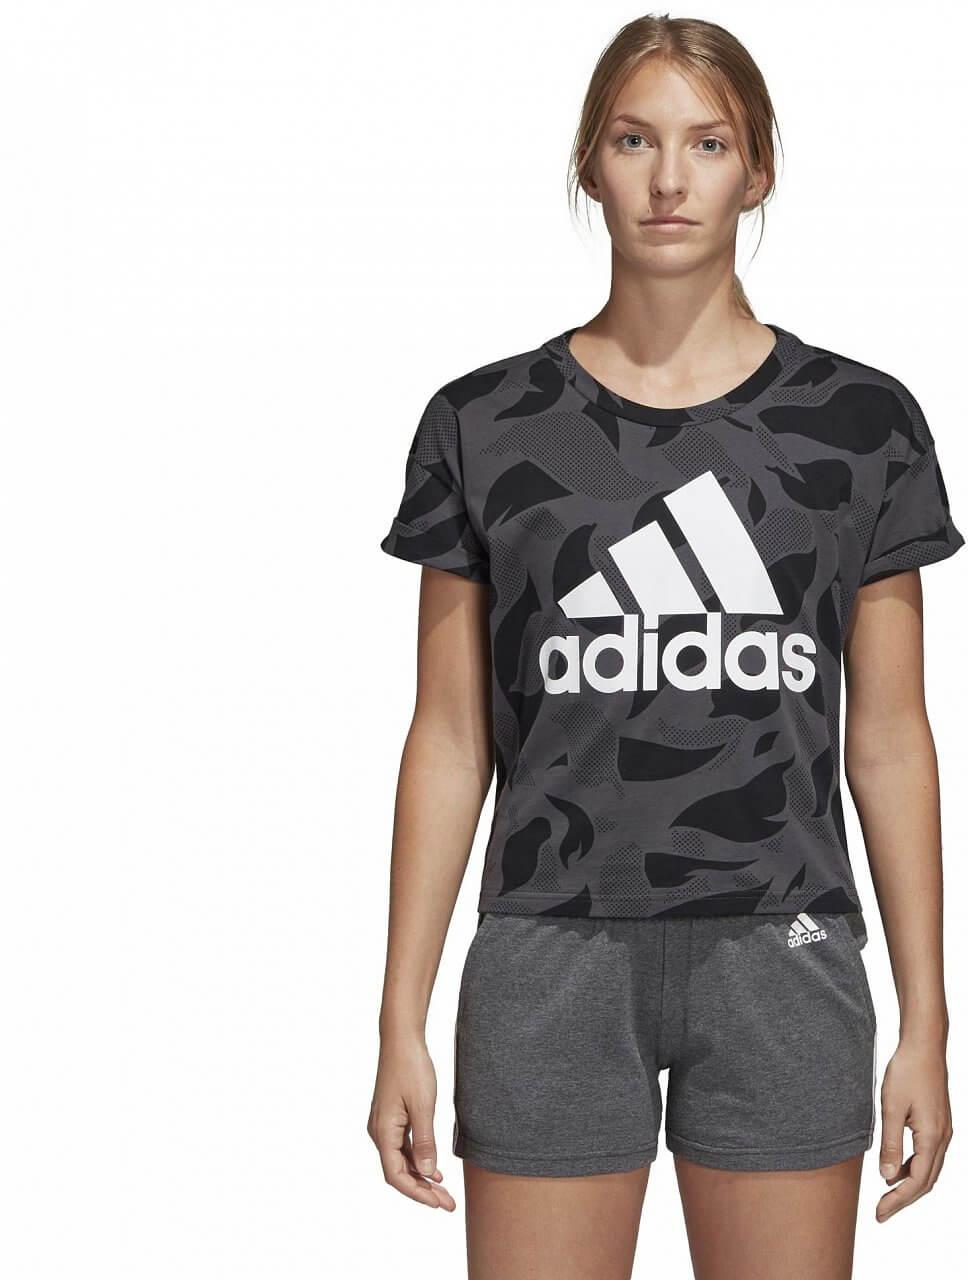 Dámské sportovní tričko adidas Essentials All Over Printed Tee